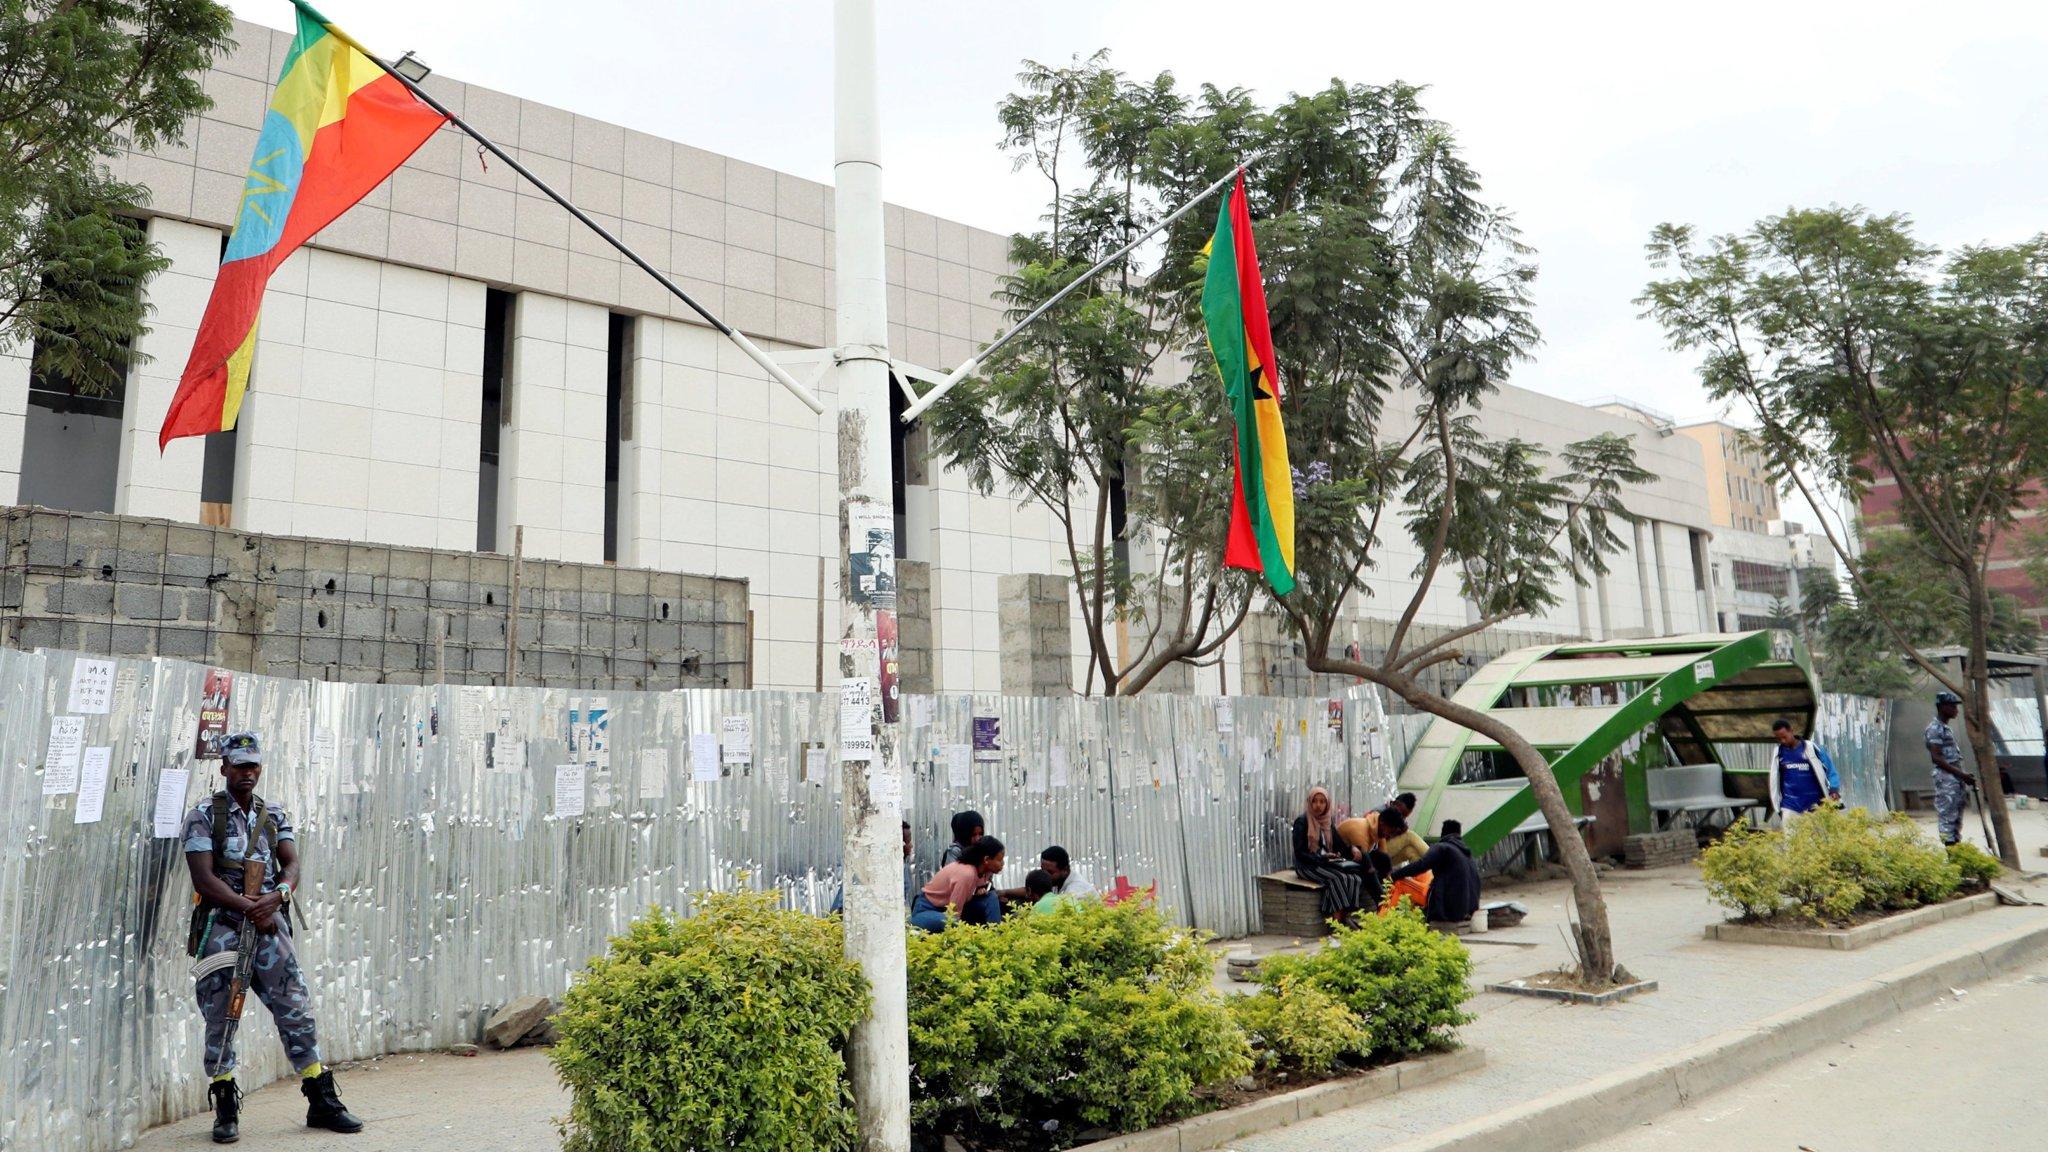 Ethiopia arrests senior officials in corruption crackdown